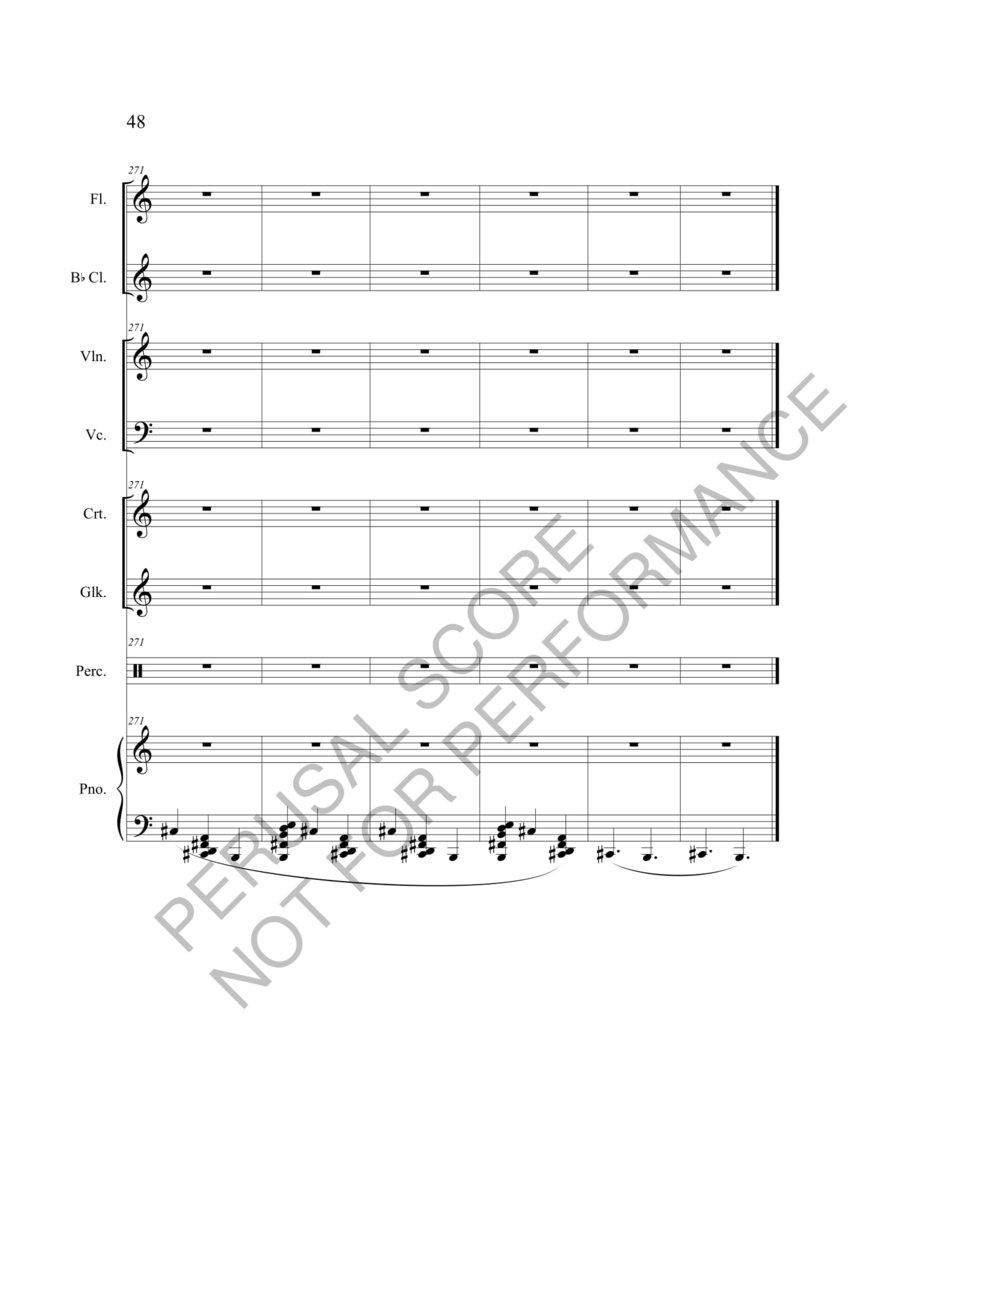 Boyd Terra Liberi Score-watermark-54.jpg